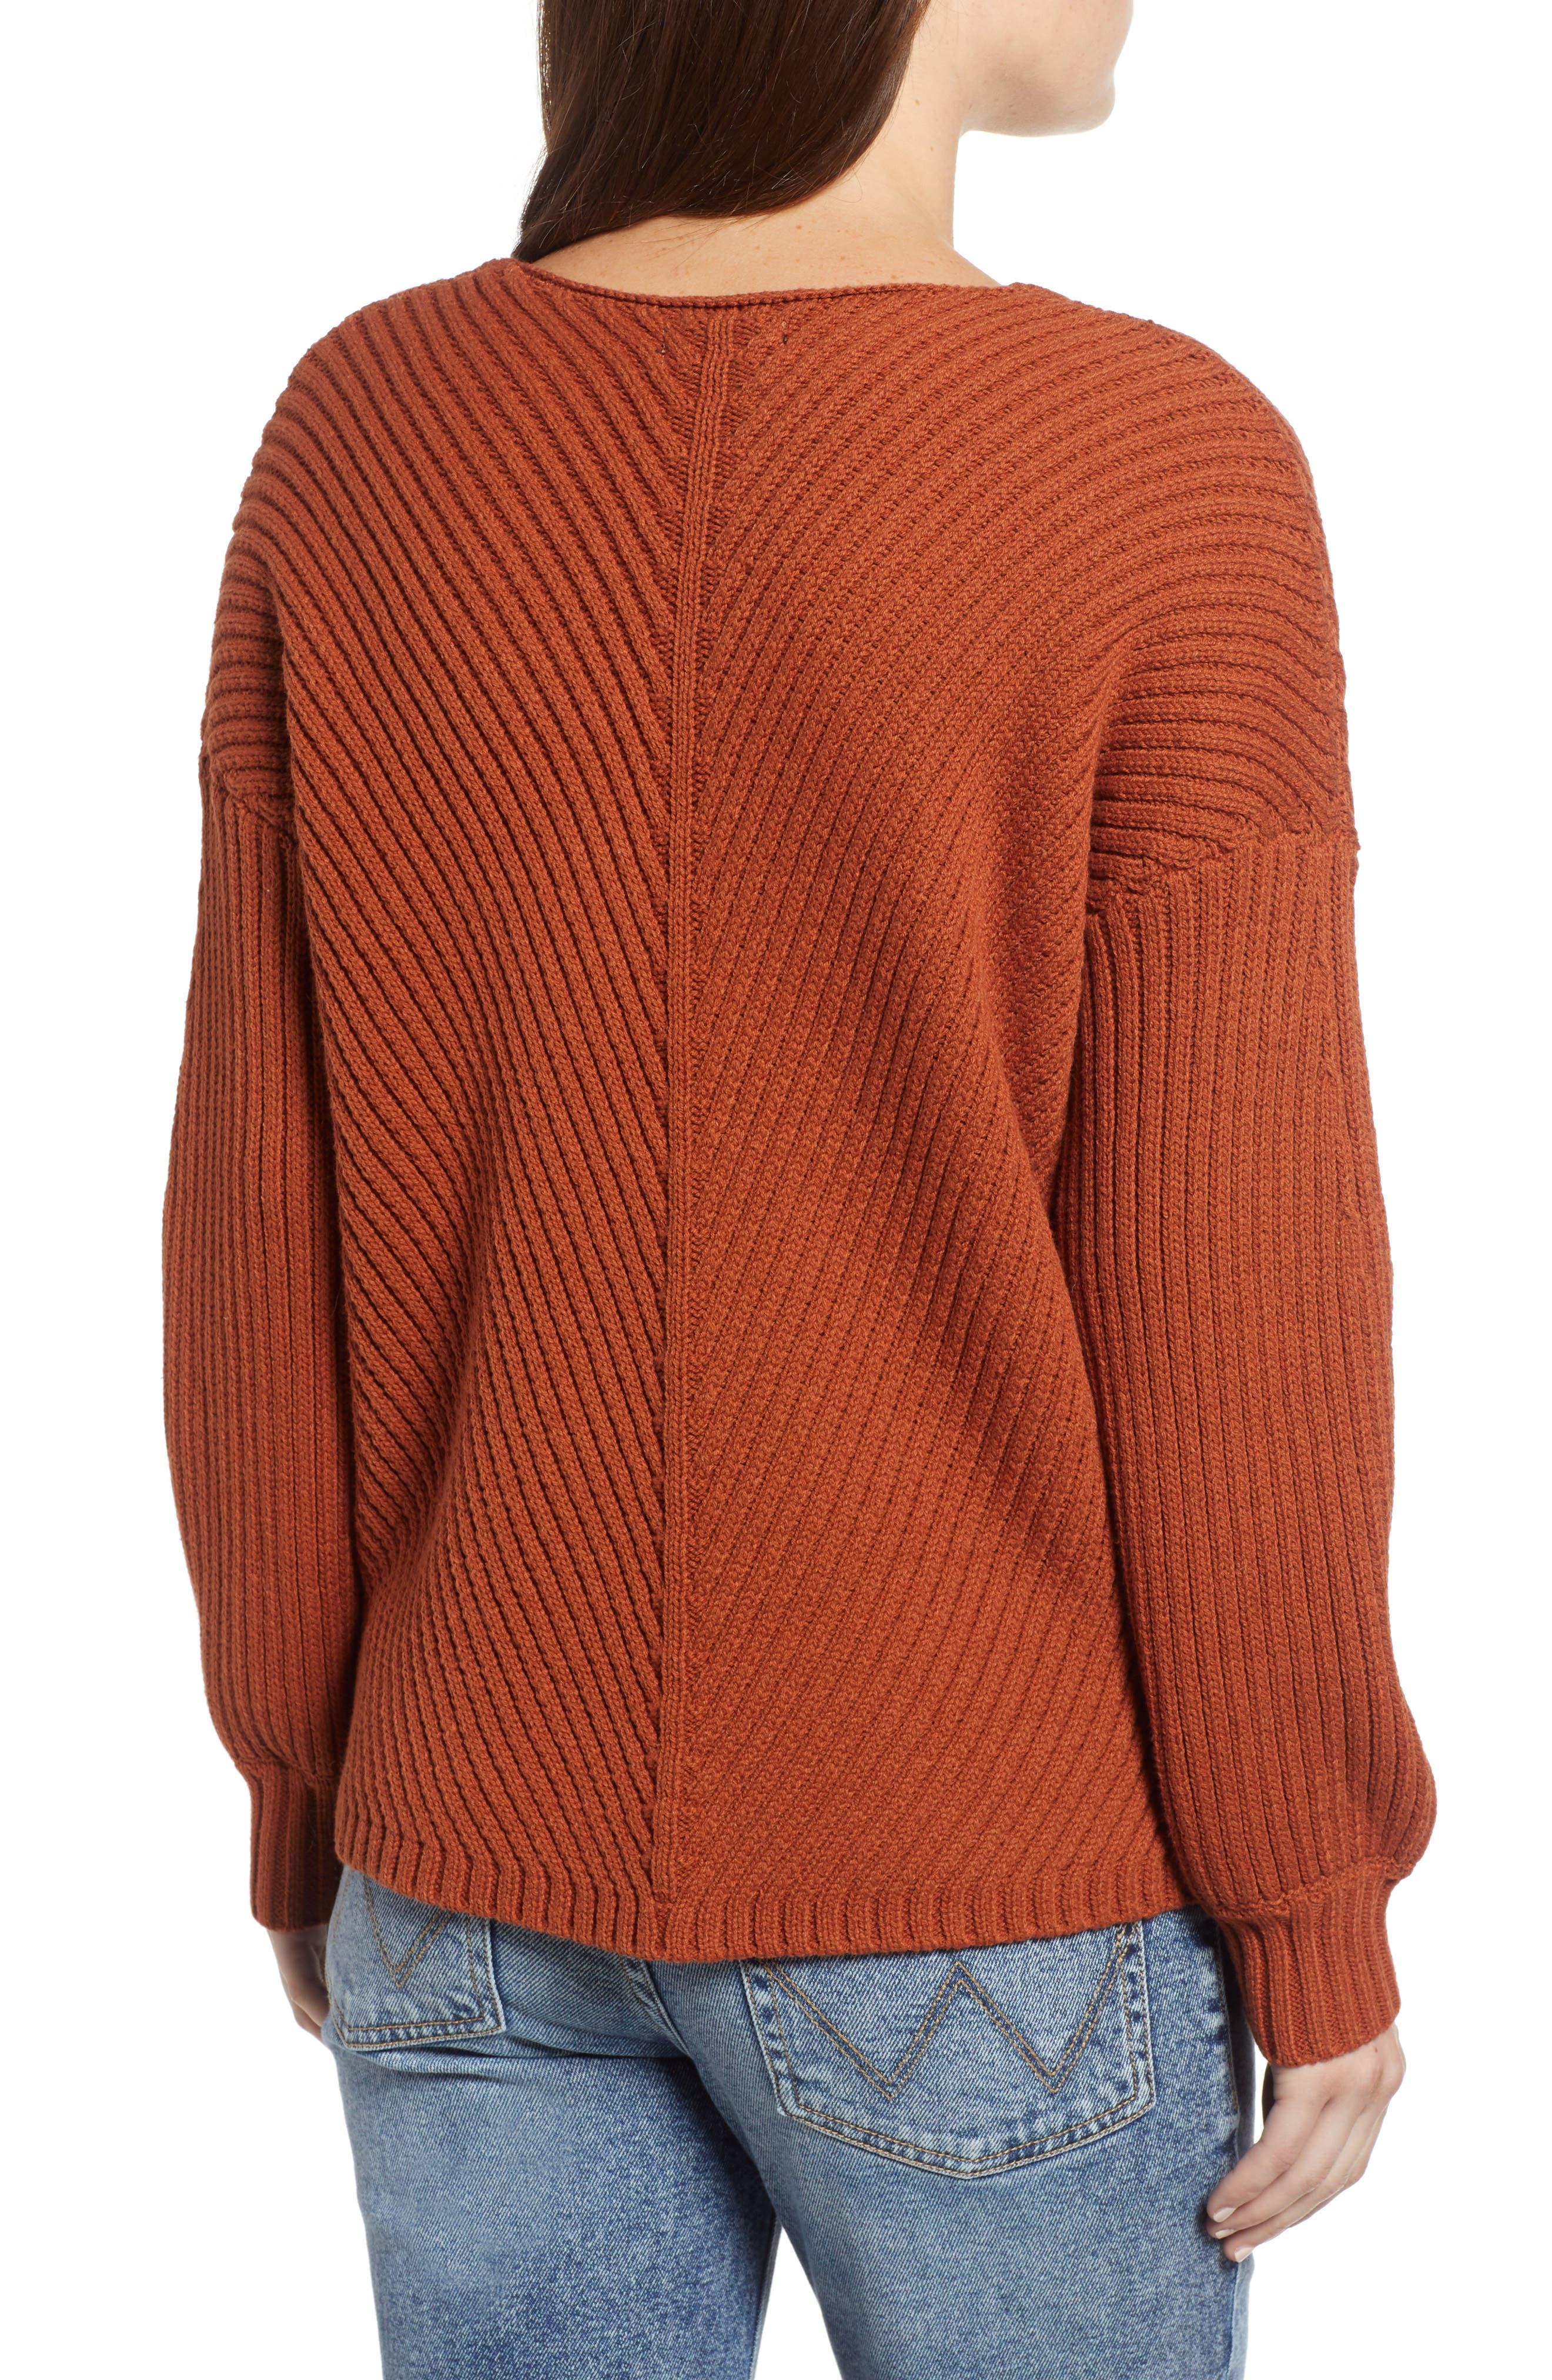 Eleanor Rib Knit Sweater,                             Alternate thumbnail 2, color,                             200